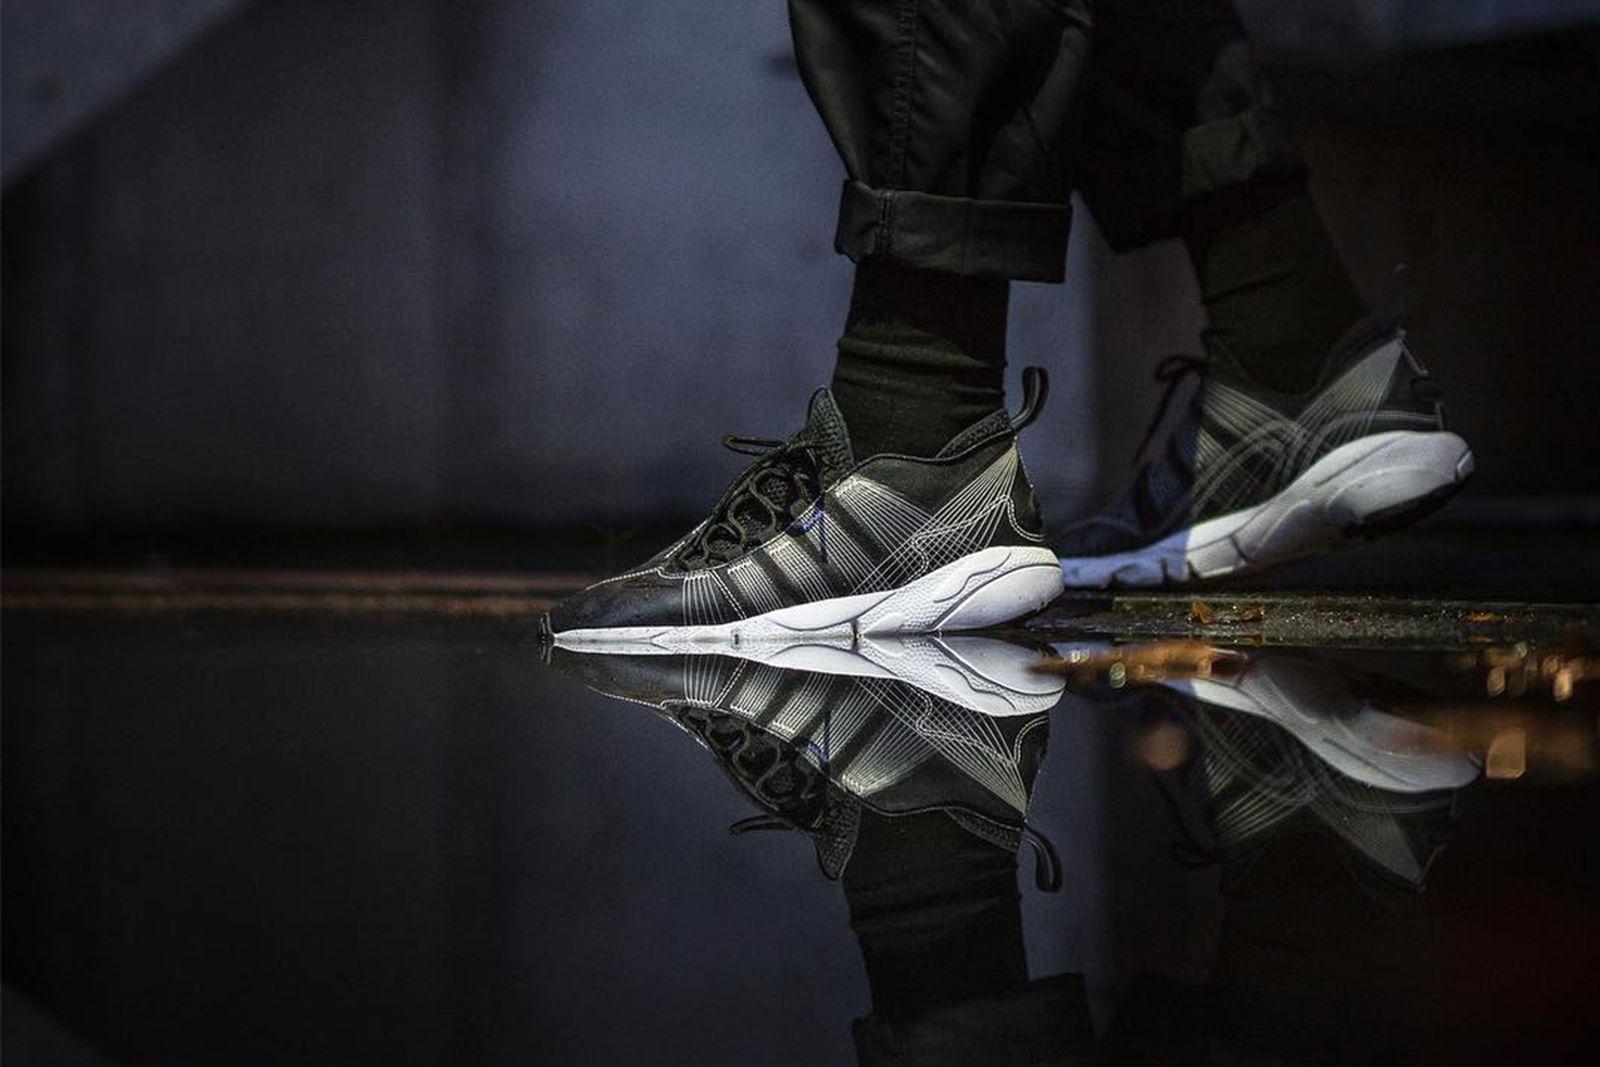 union air jordan 1 best ig sneakers OFF-WHITE c/o Virgil Abloh Reebok Instapump Fury Union x Jordan Brand